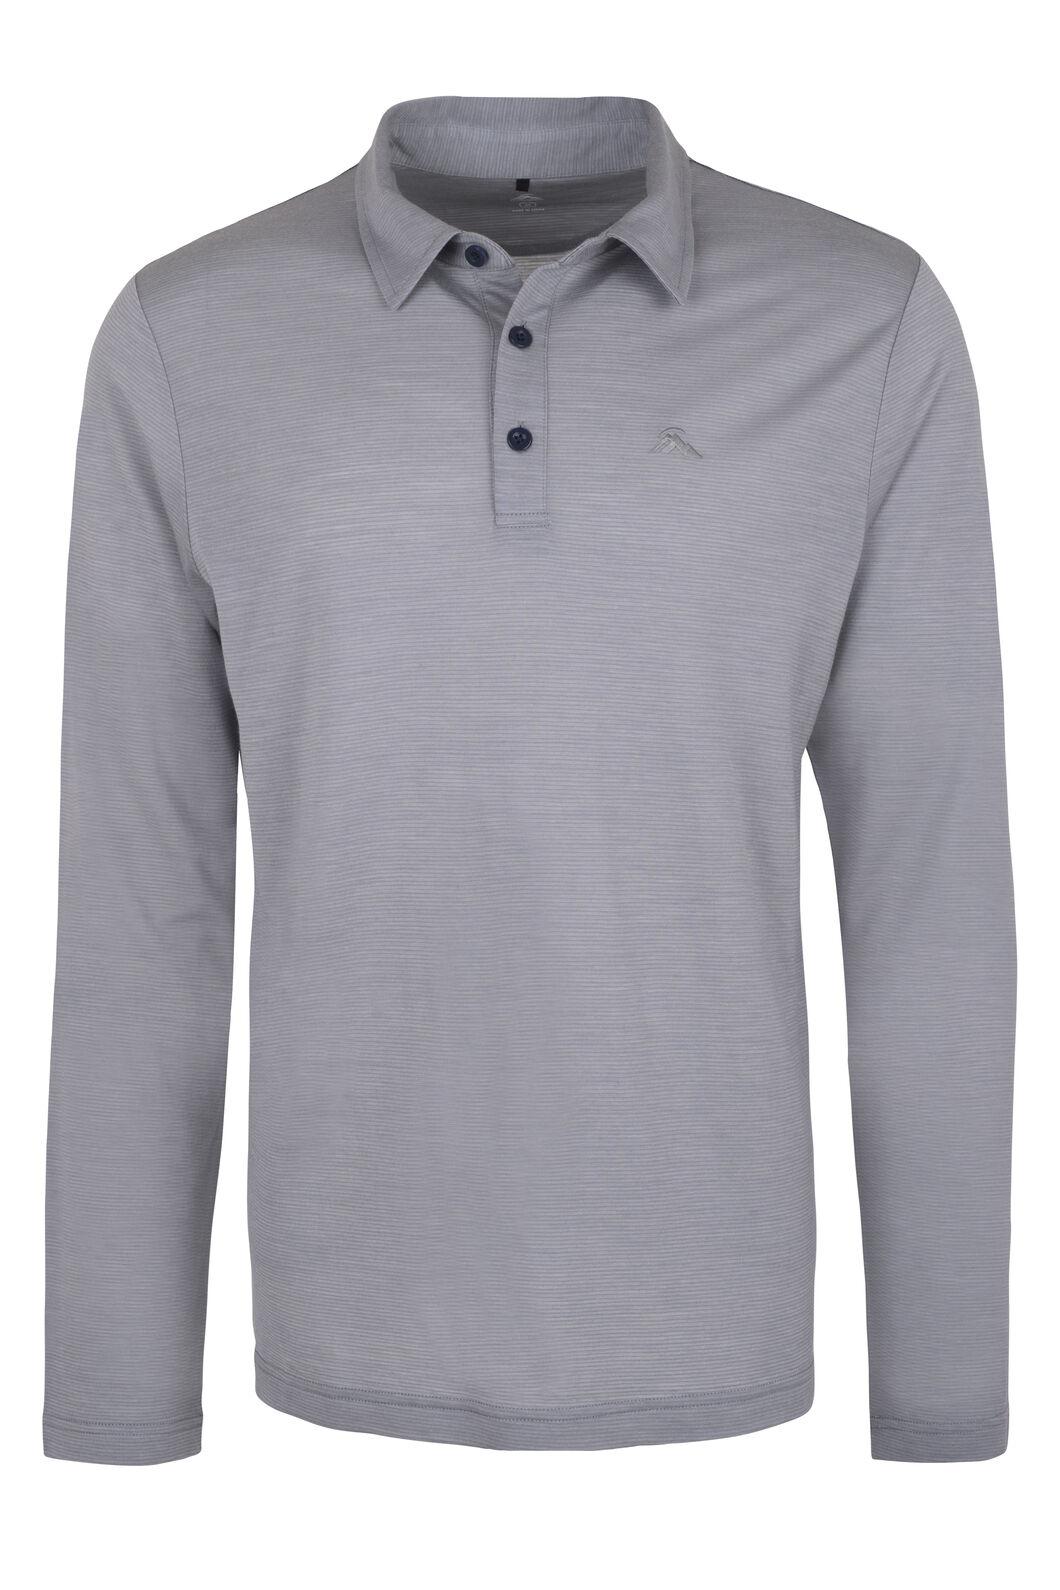 Macpac Merino Blend Long Sleeve Polo - Men's, Mid Grey, hi-res